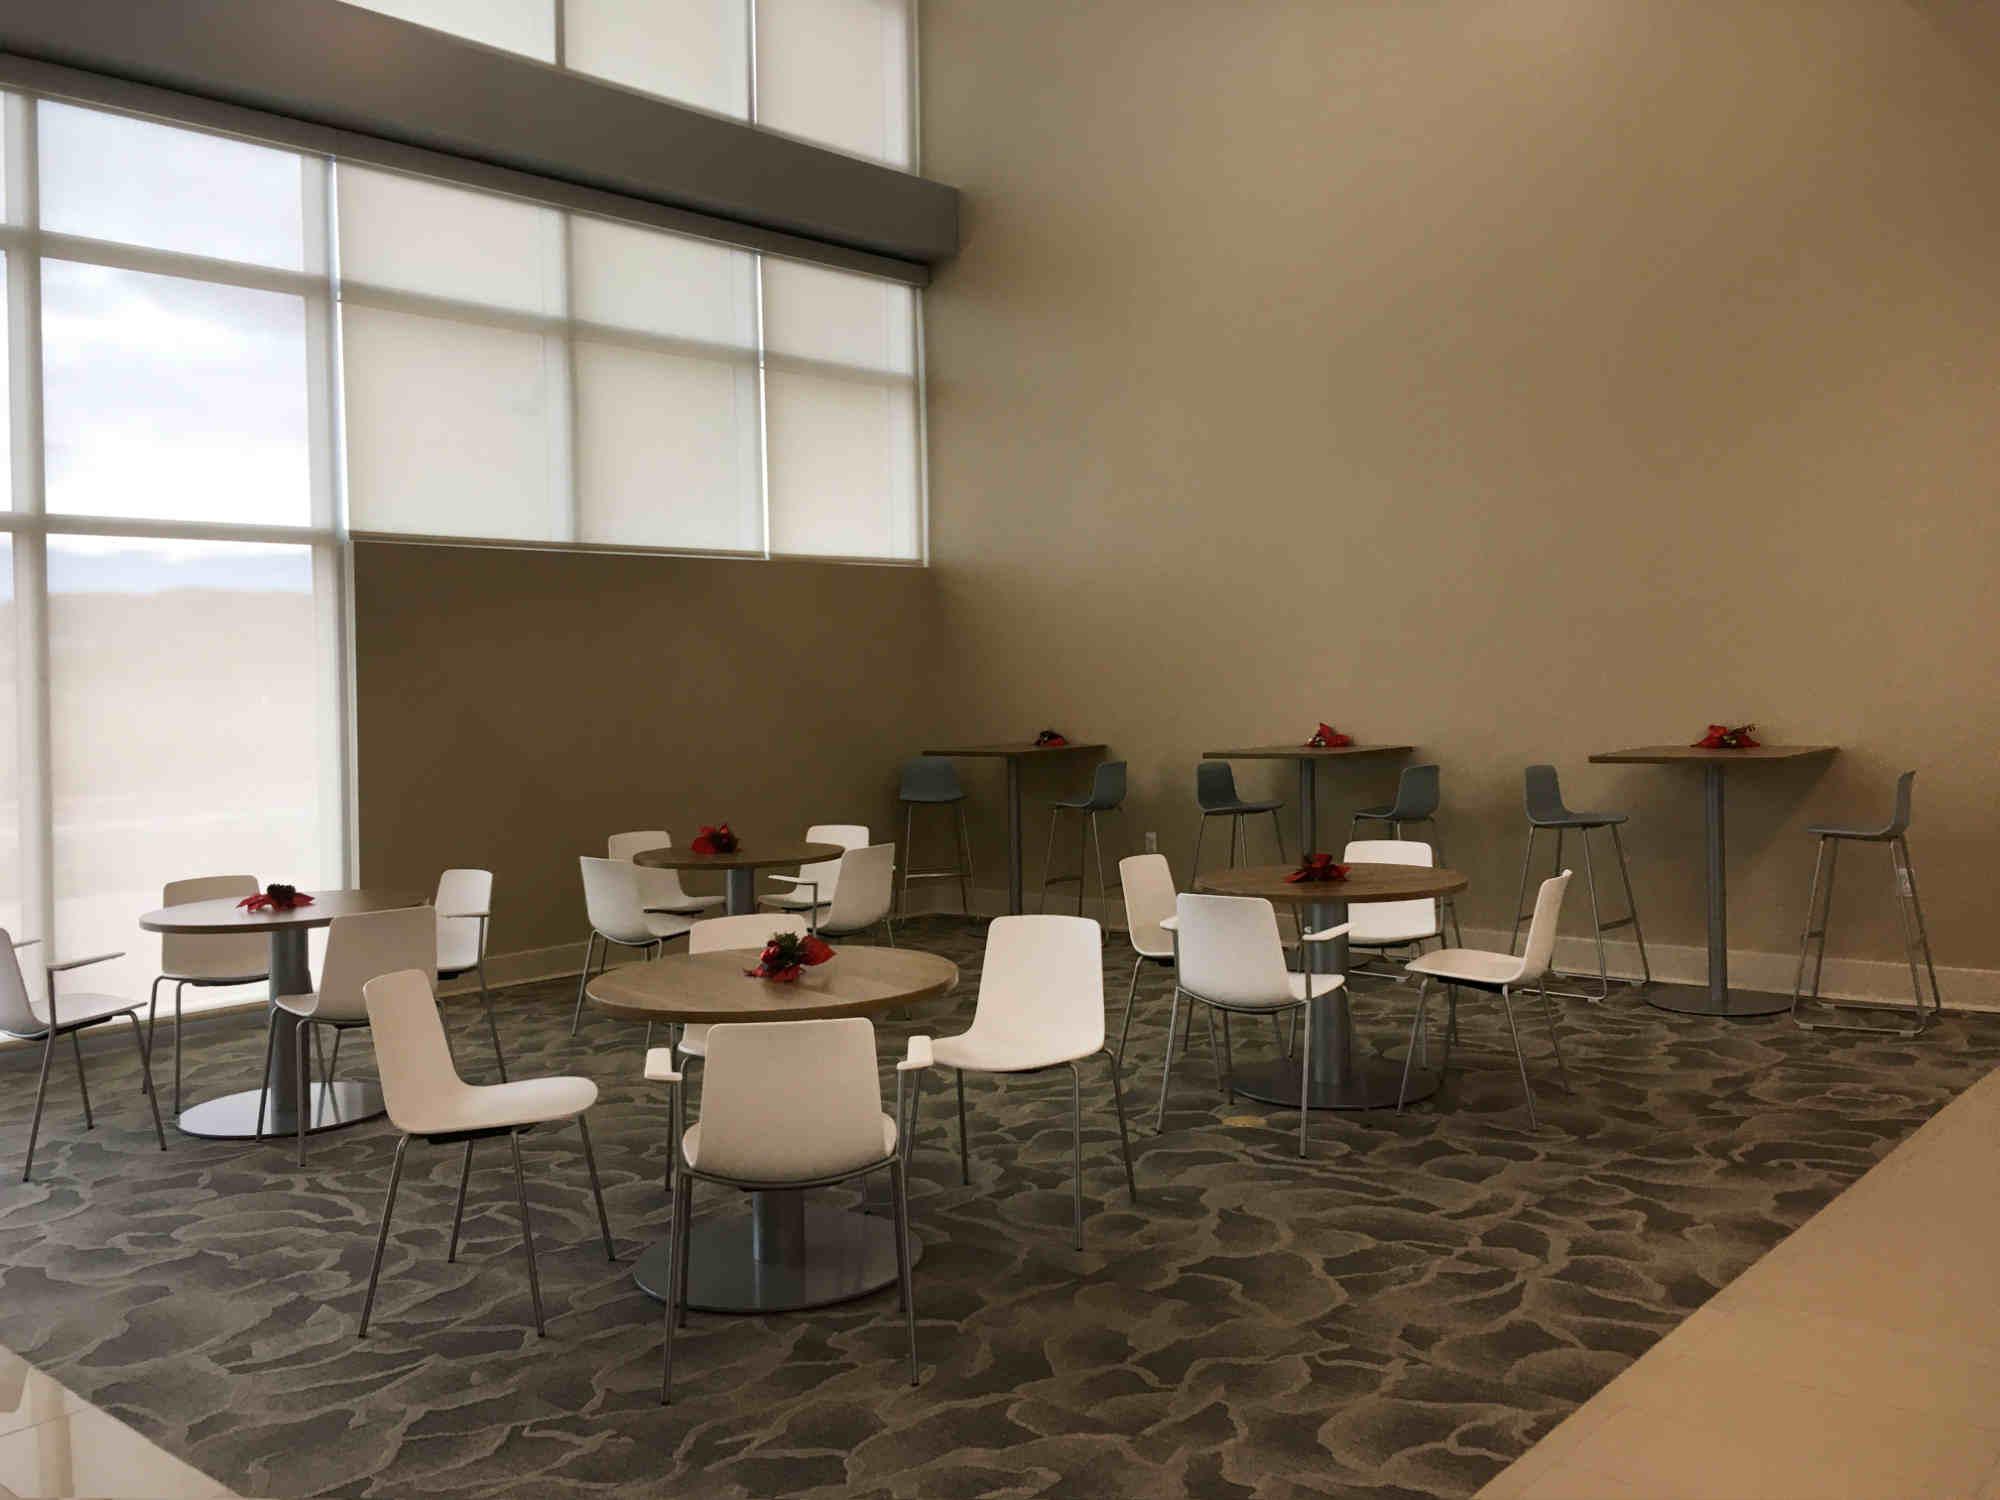 seating area at Sweet Beans Coffee Shop inside Sierra Vista Hospital